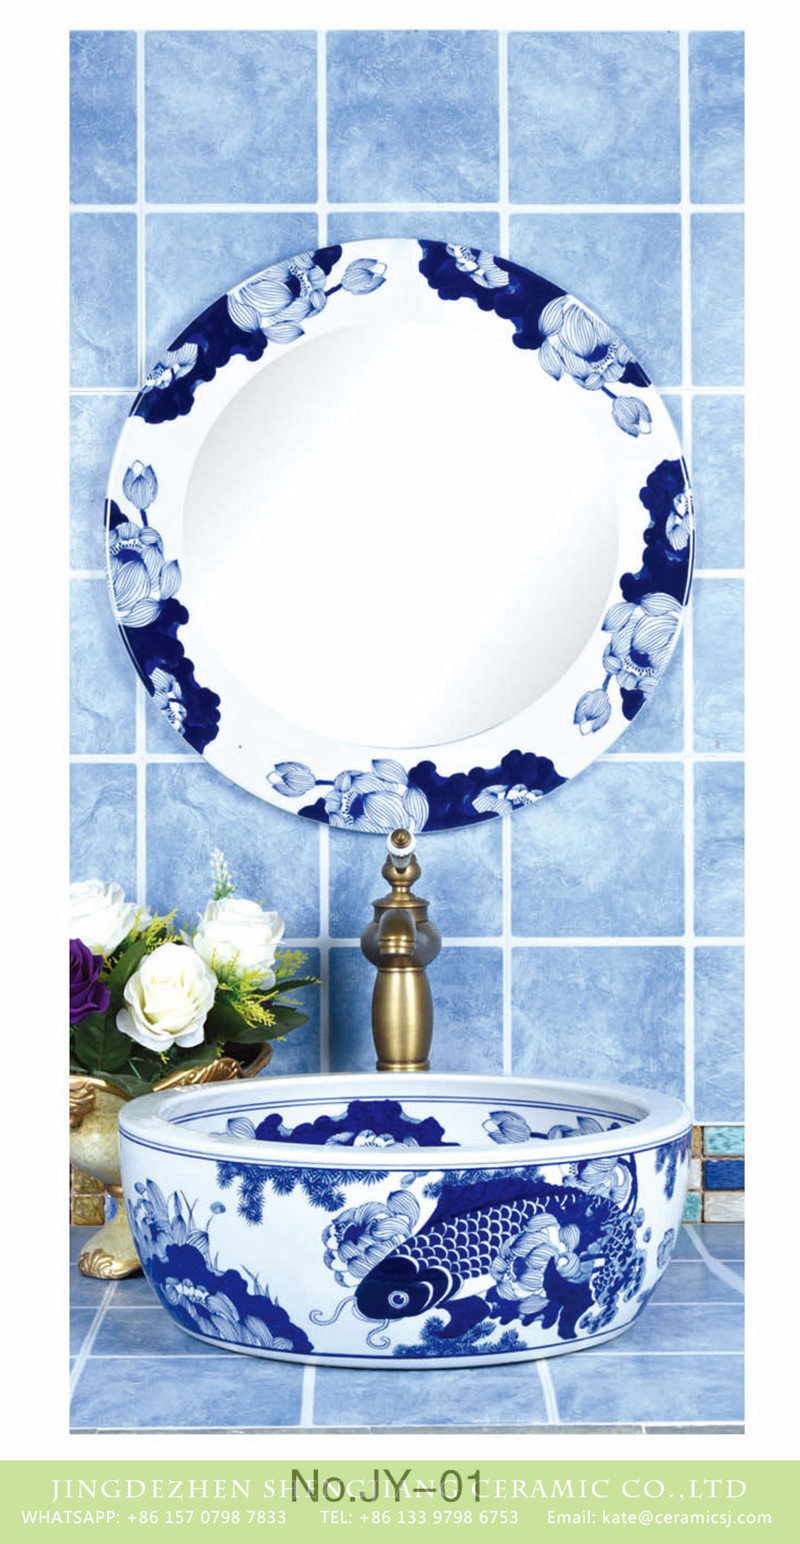 SJJY-01-2青花台盆_03-1 Jingdezhen Shengjiang factory produce blue and white ceramic with fish pattern wash basin - shengjiang  ceramic  factory   porcelain art hand basin wash sink